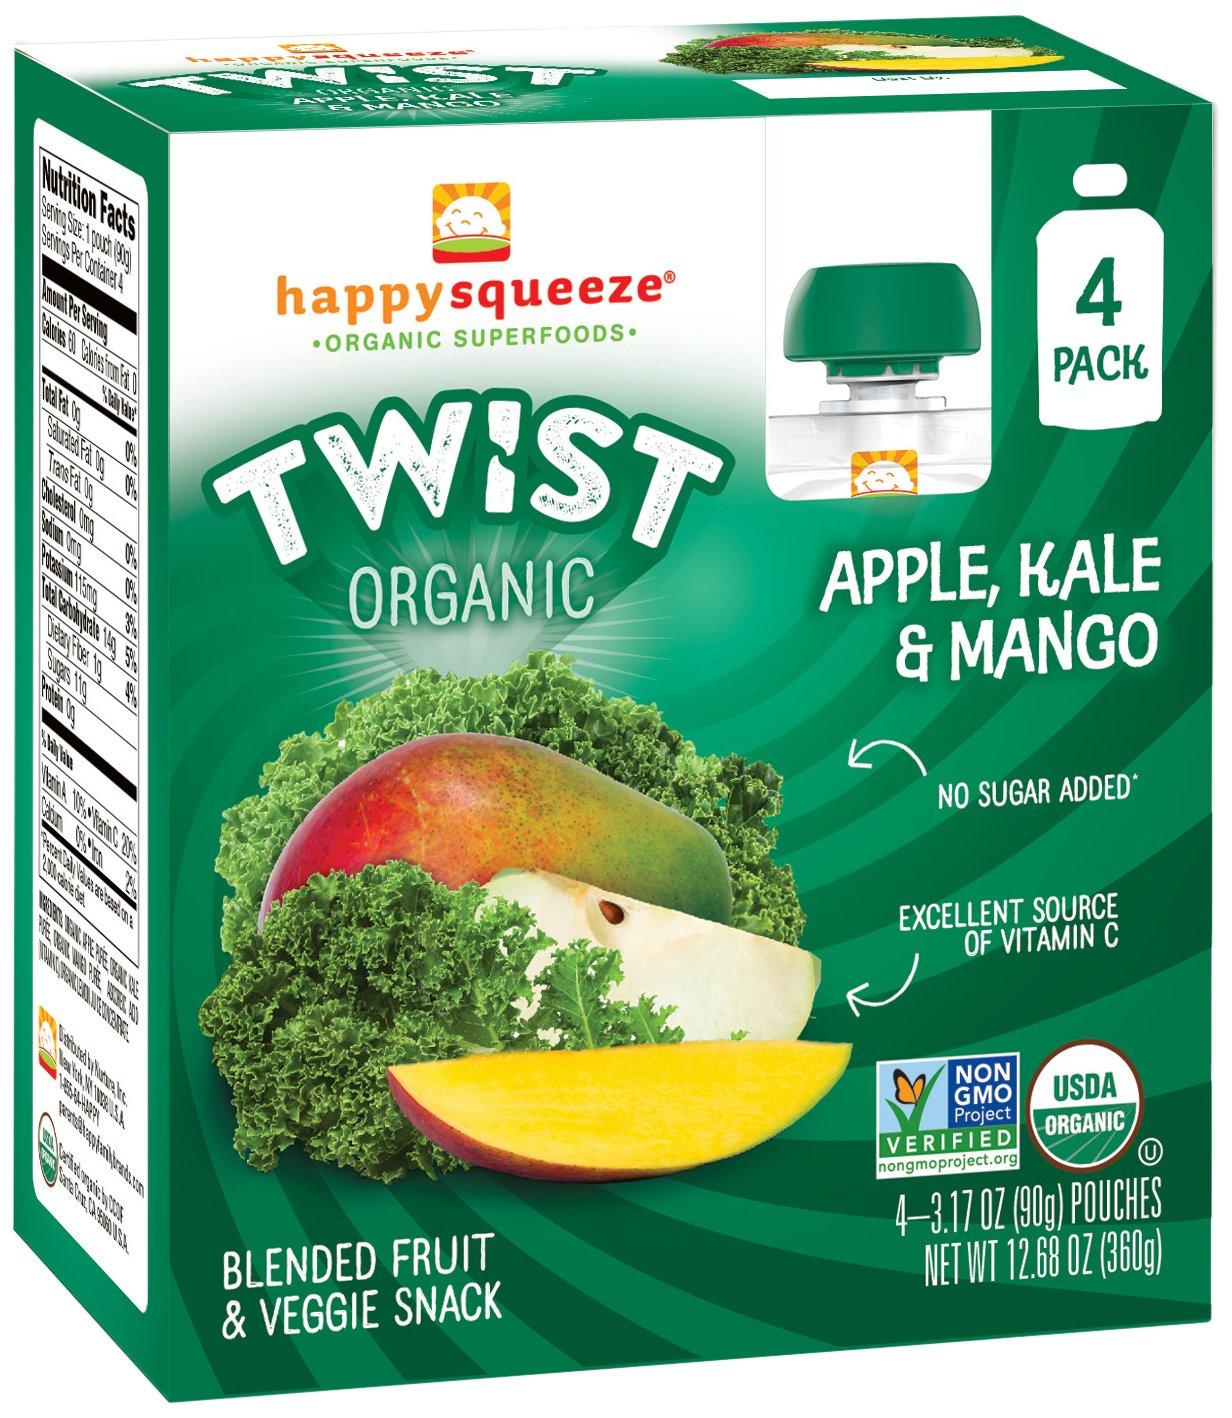 afa4f7b558 Happy Squeeze Organic Superfoods Twist Apple Kale Mango